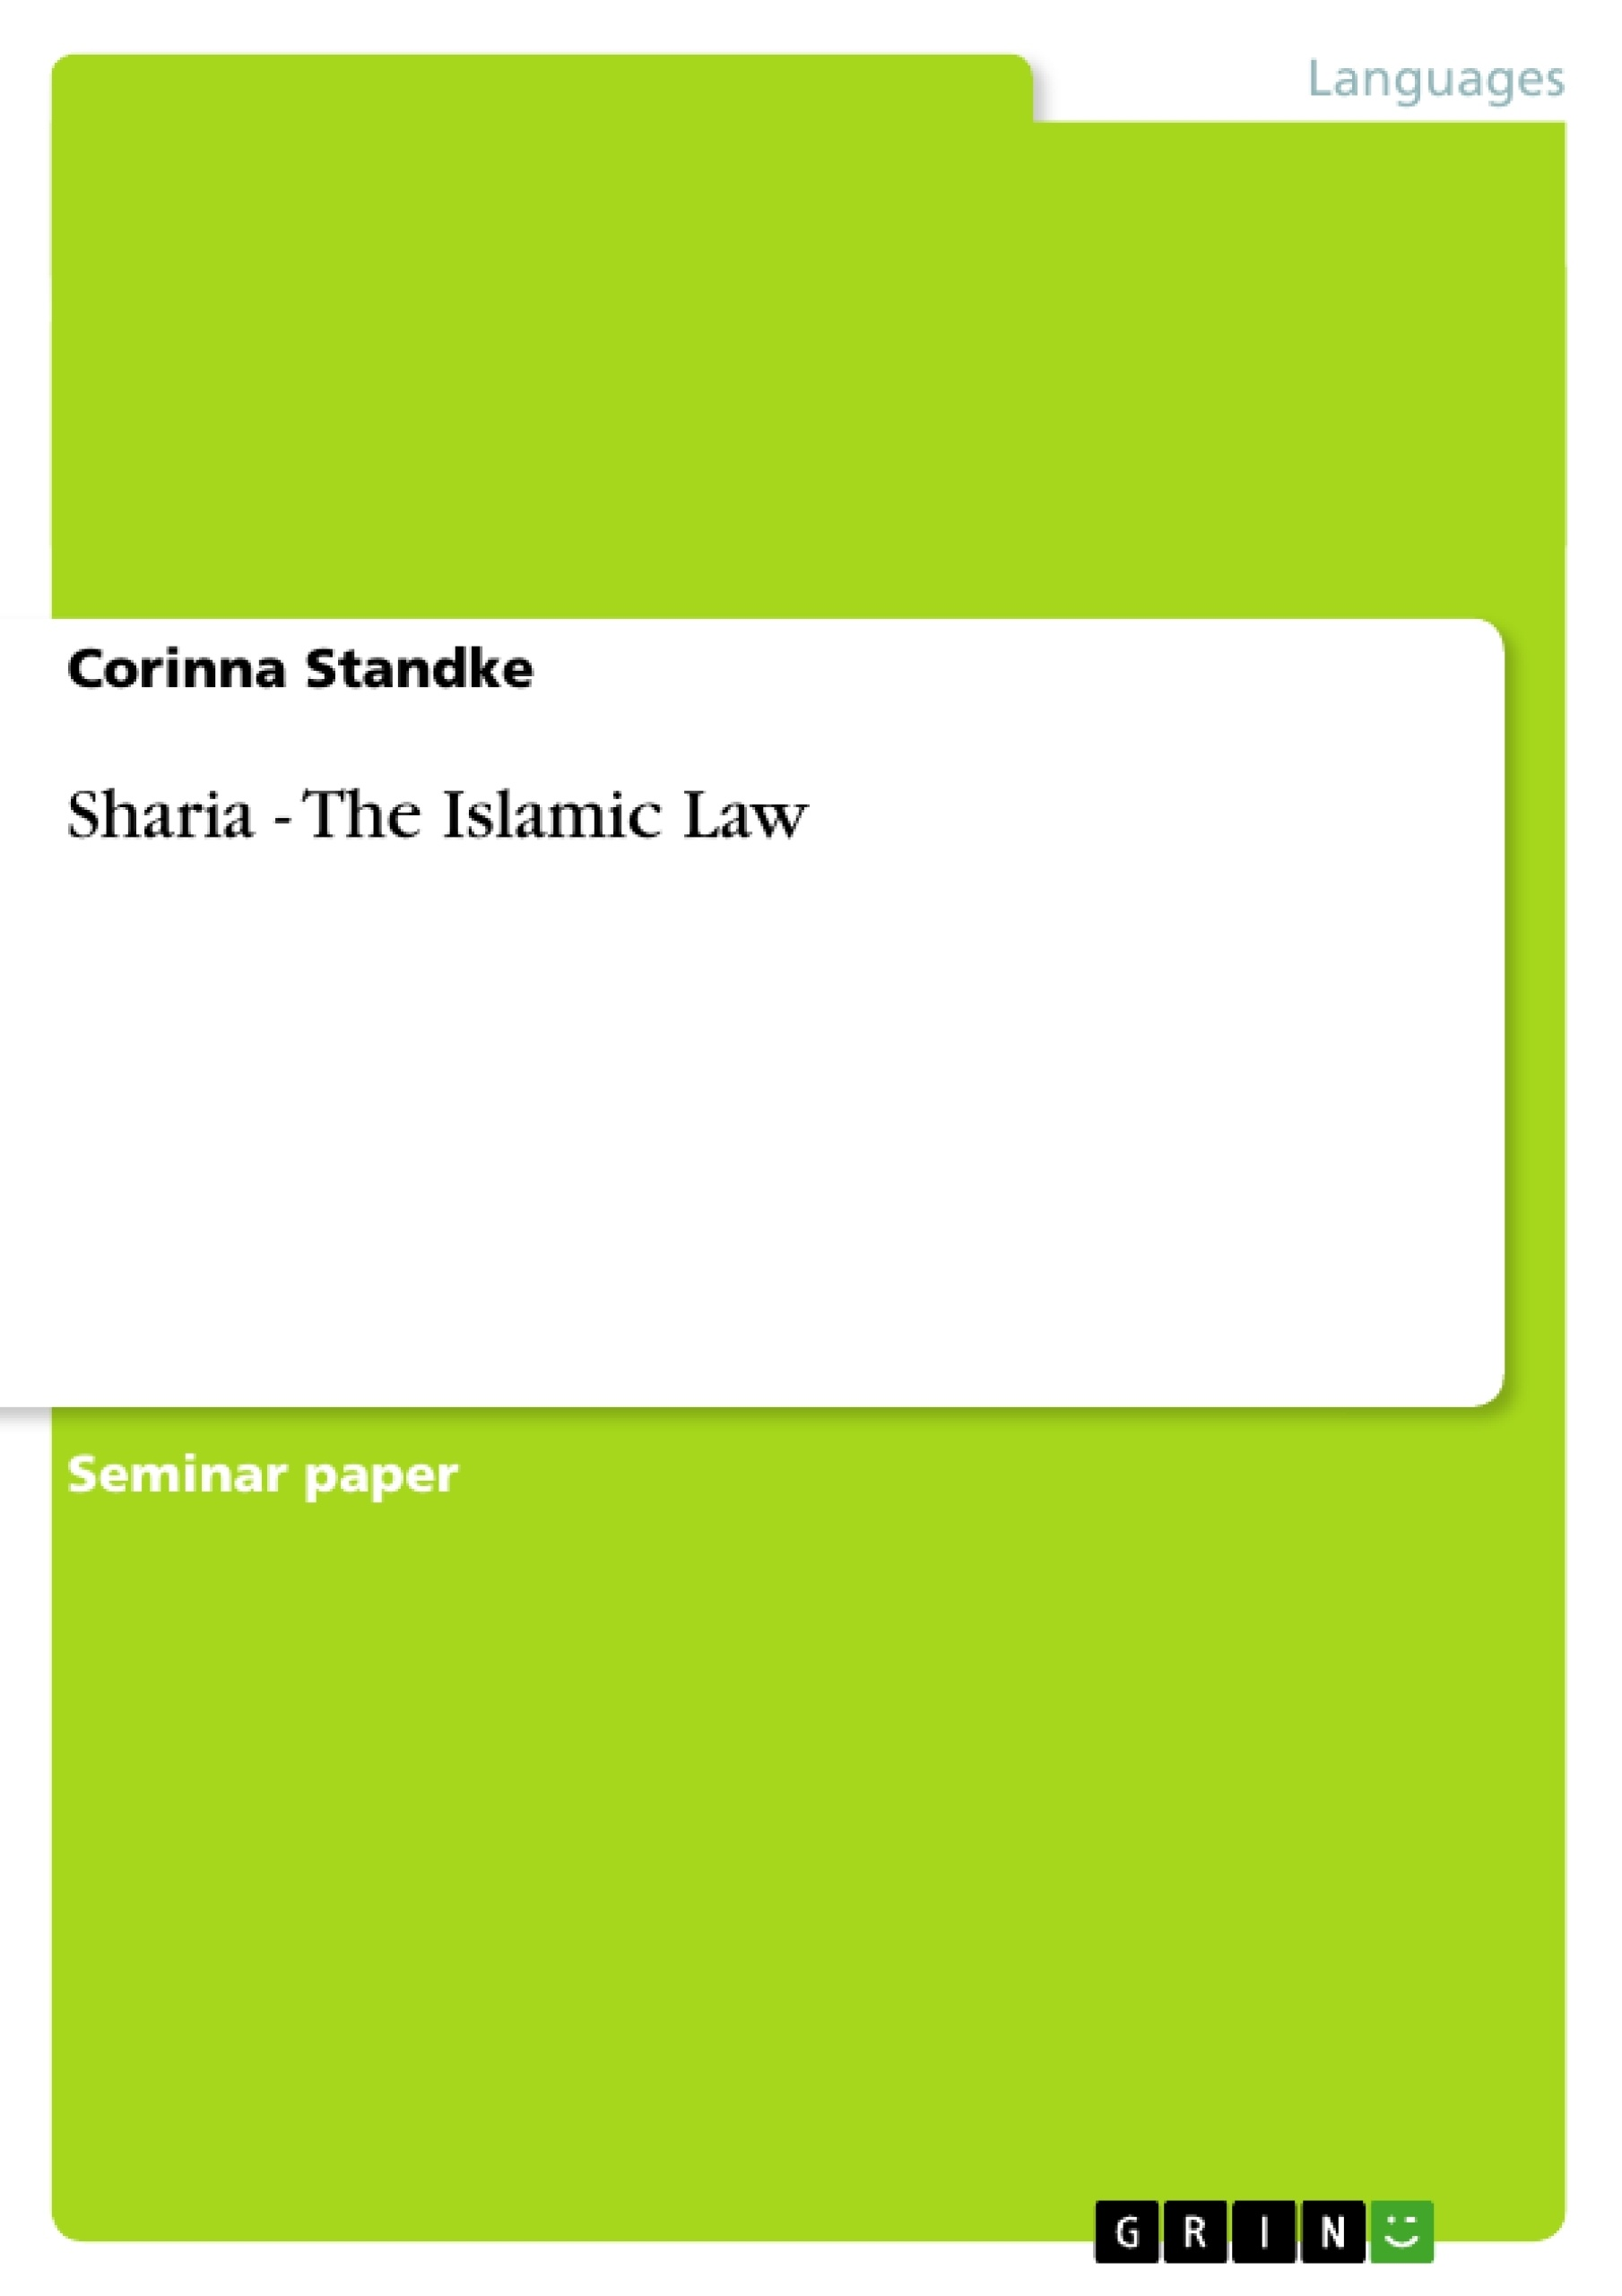 GRIN - Sharia - The Islamic Law